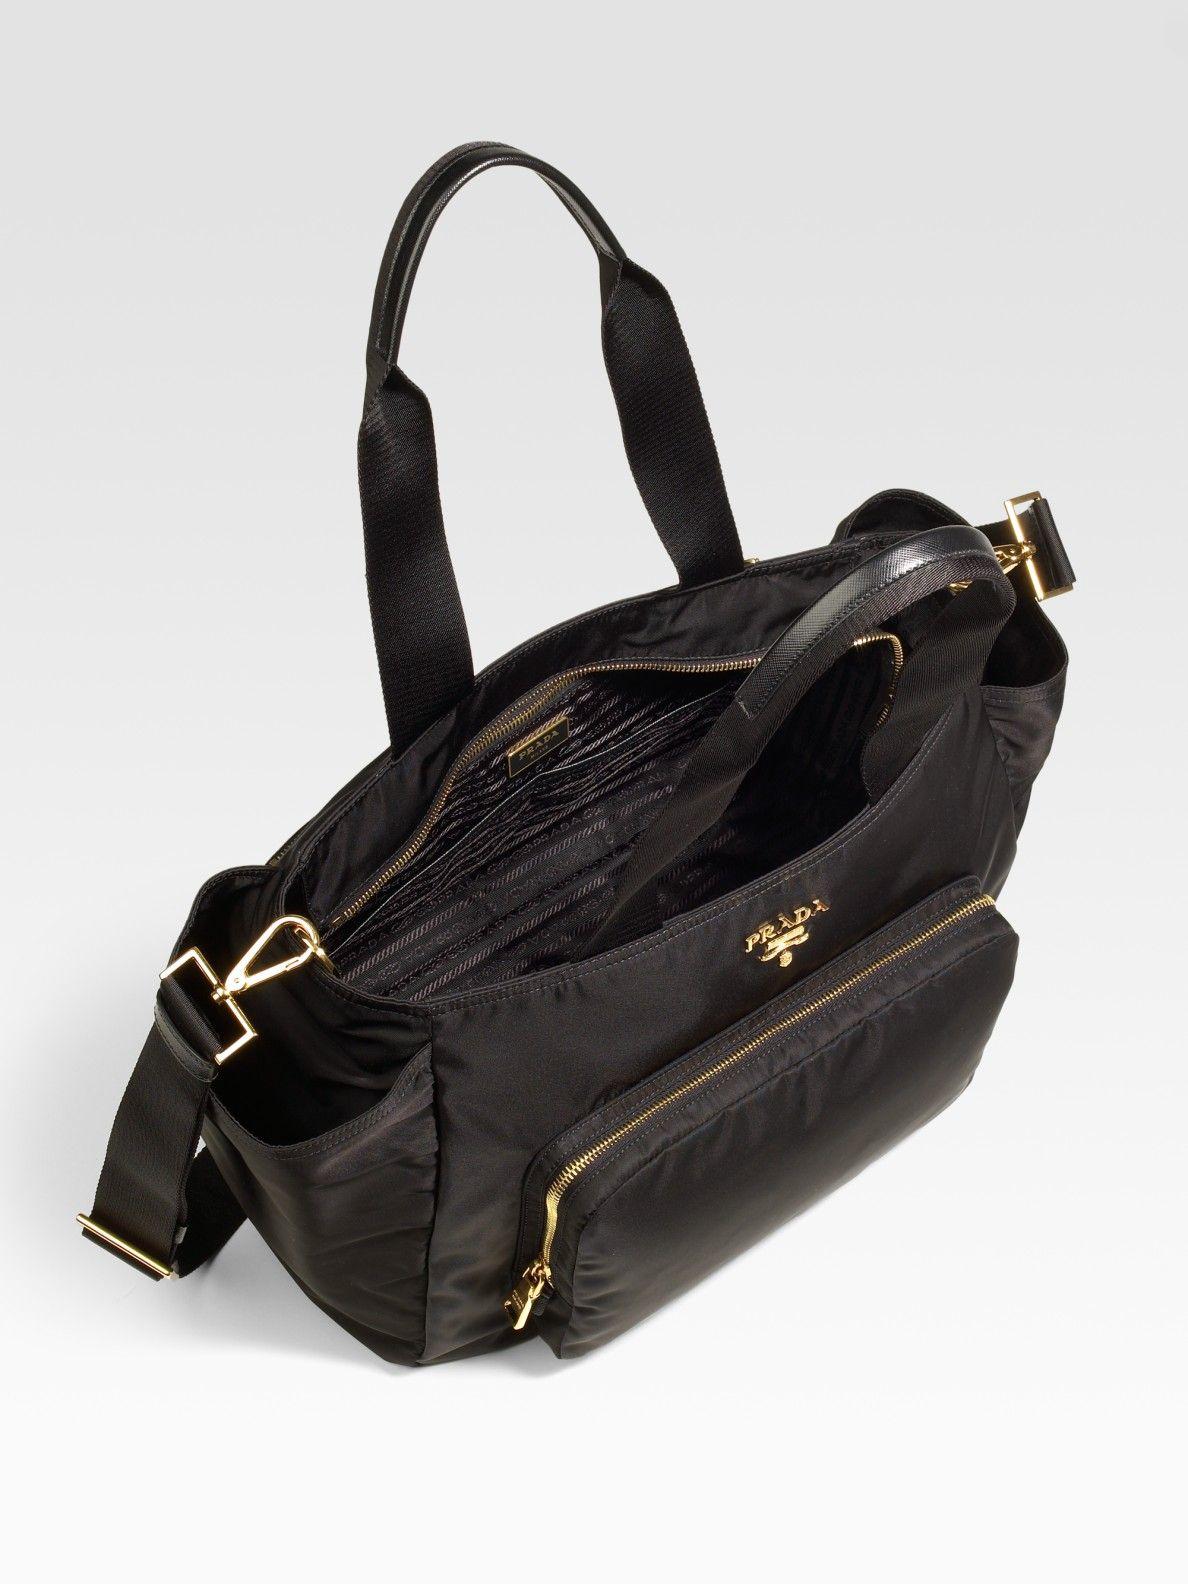 c67d7c5b6a89 Prada Nylon Baby Bag in Black